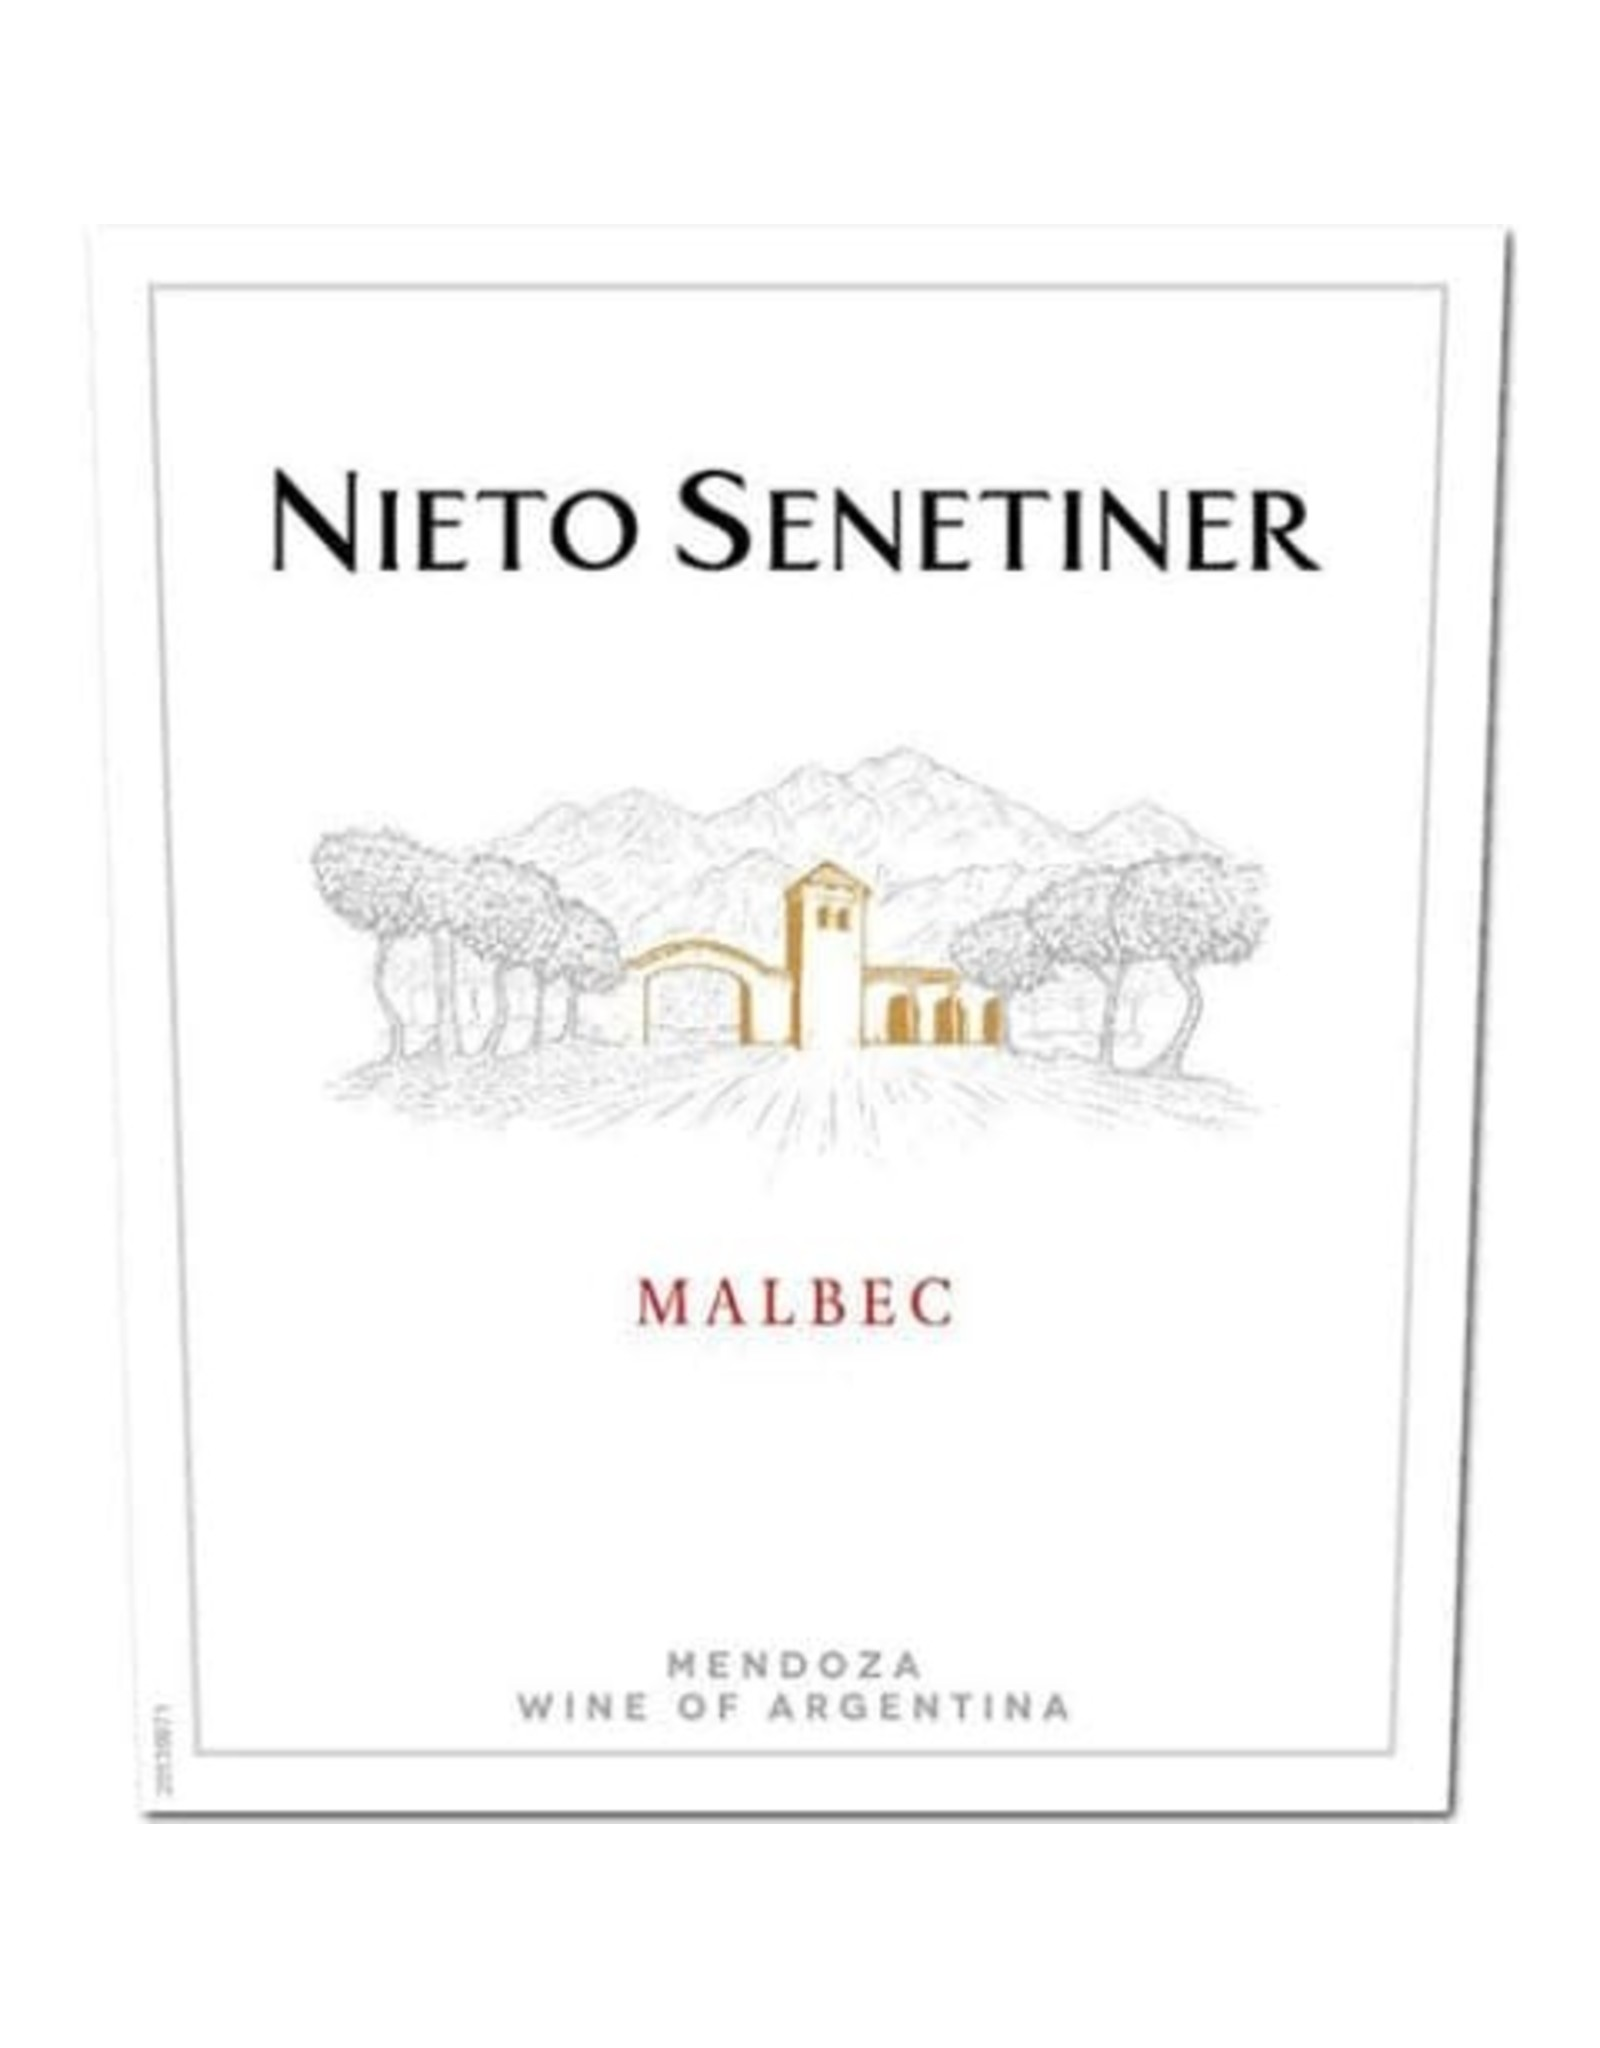 Nieto Senetiner Nieto Senetiner 'Camila' Malbec (2018)